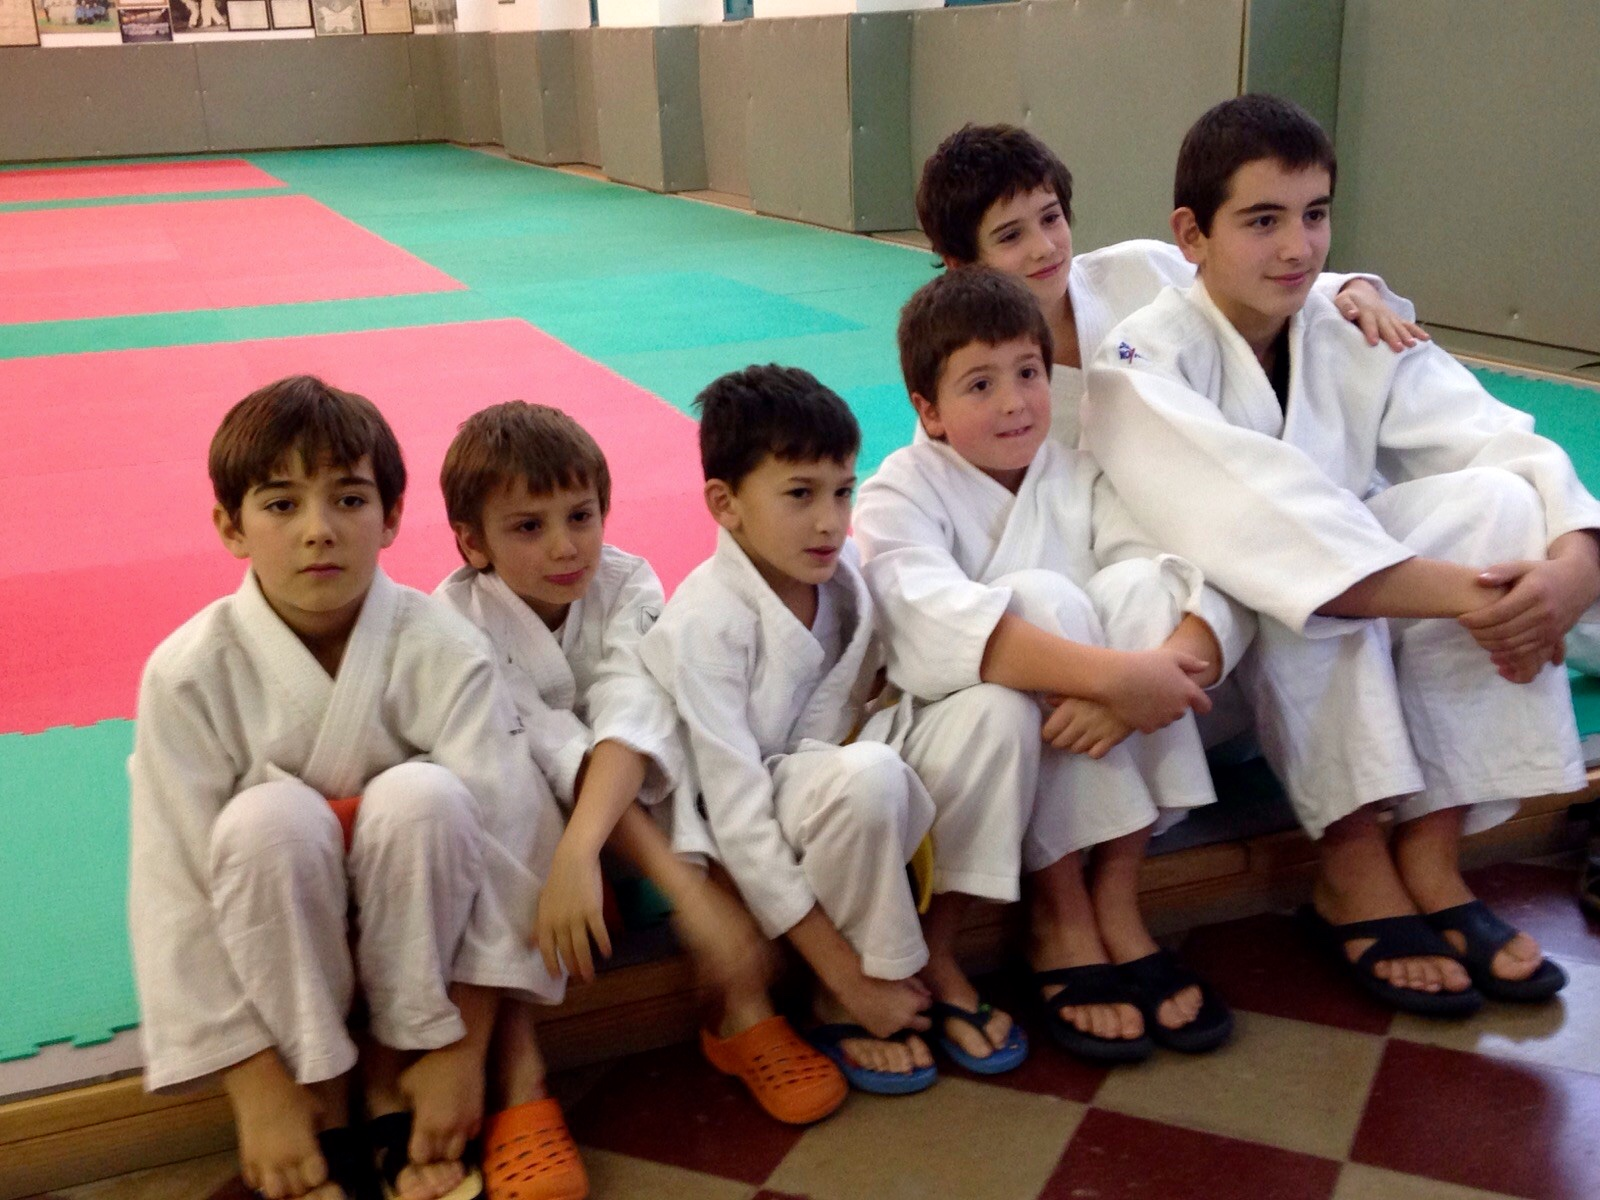 vercelli: judoka al memorial bianchi spazioforma biella